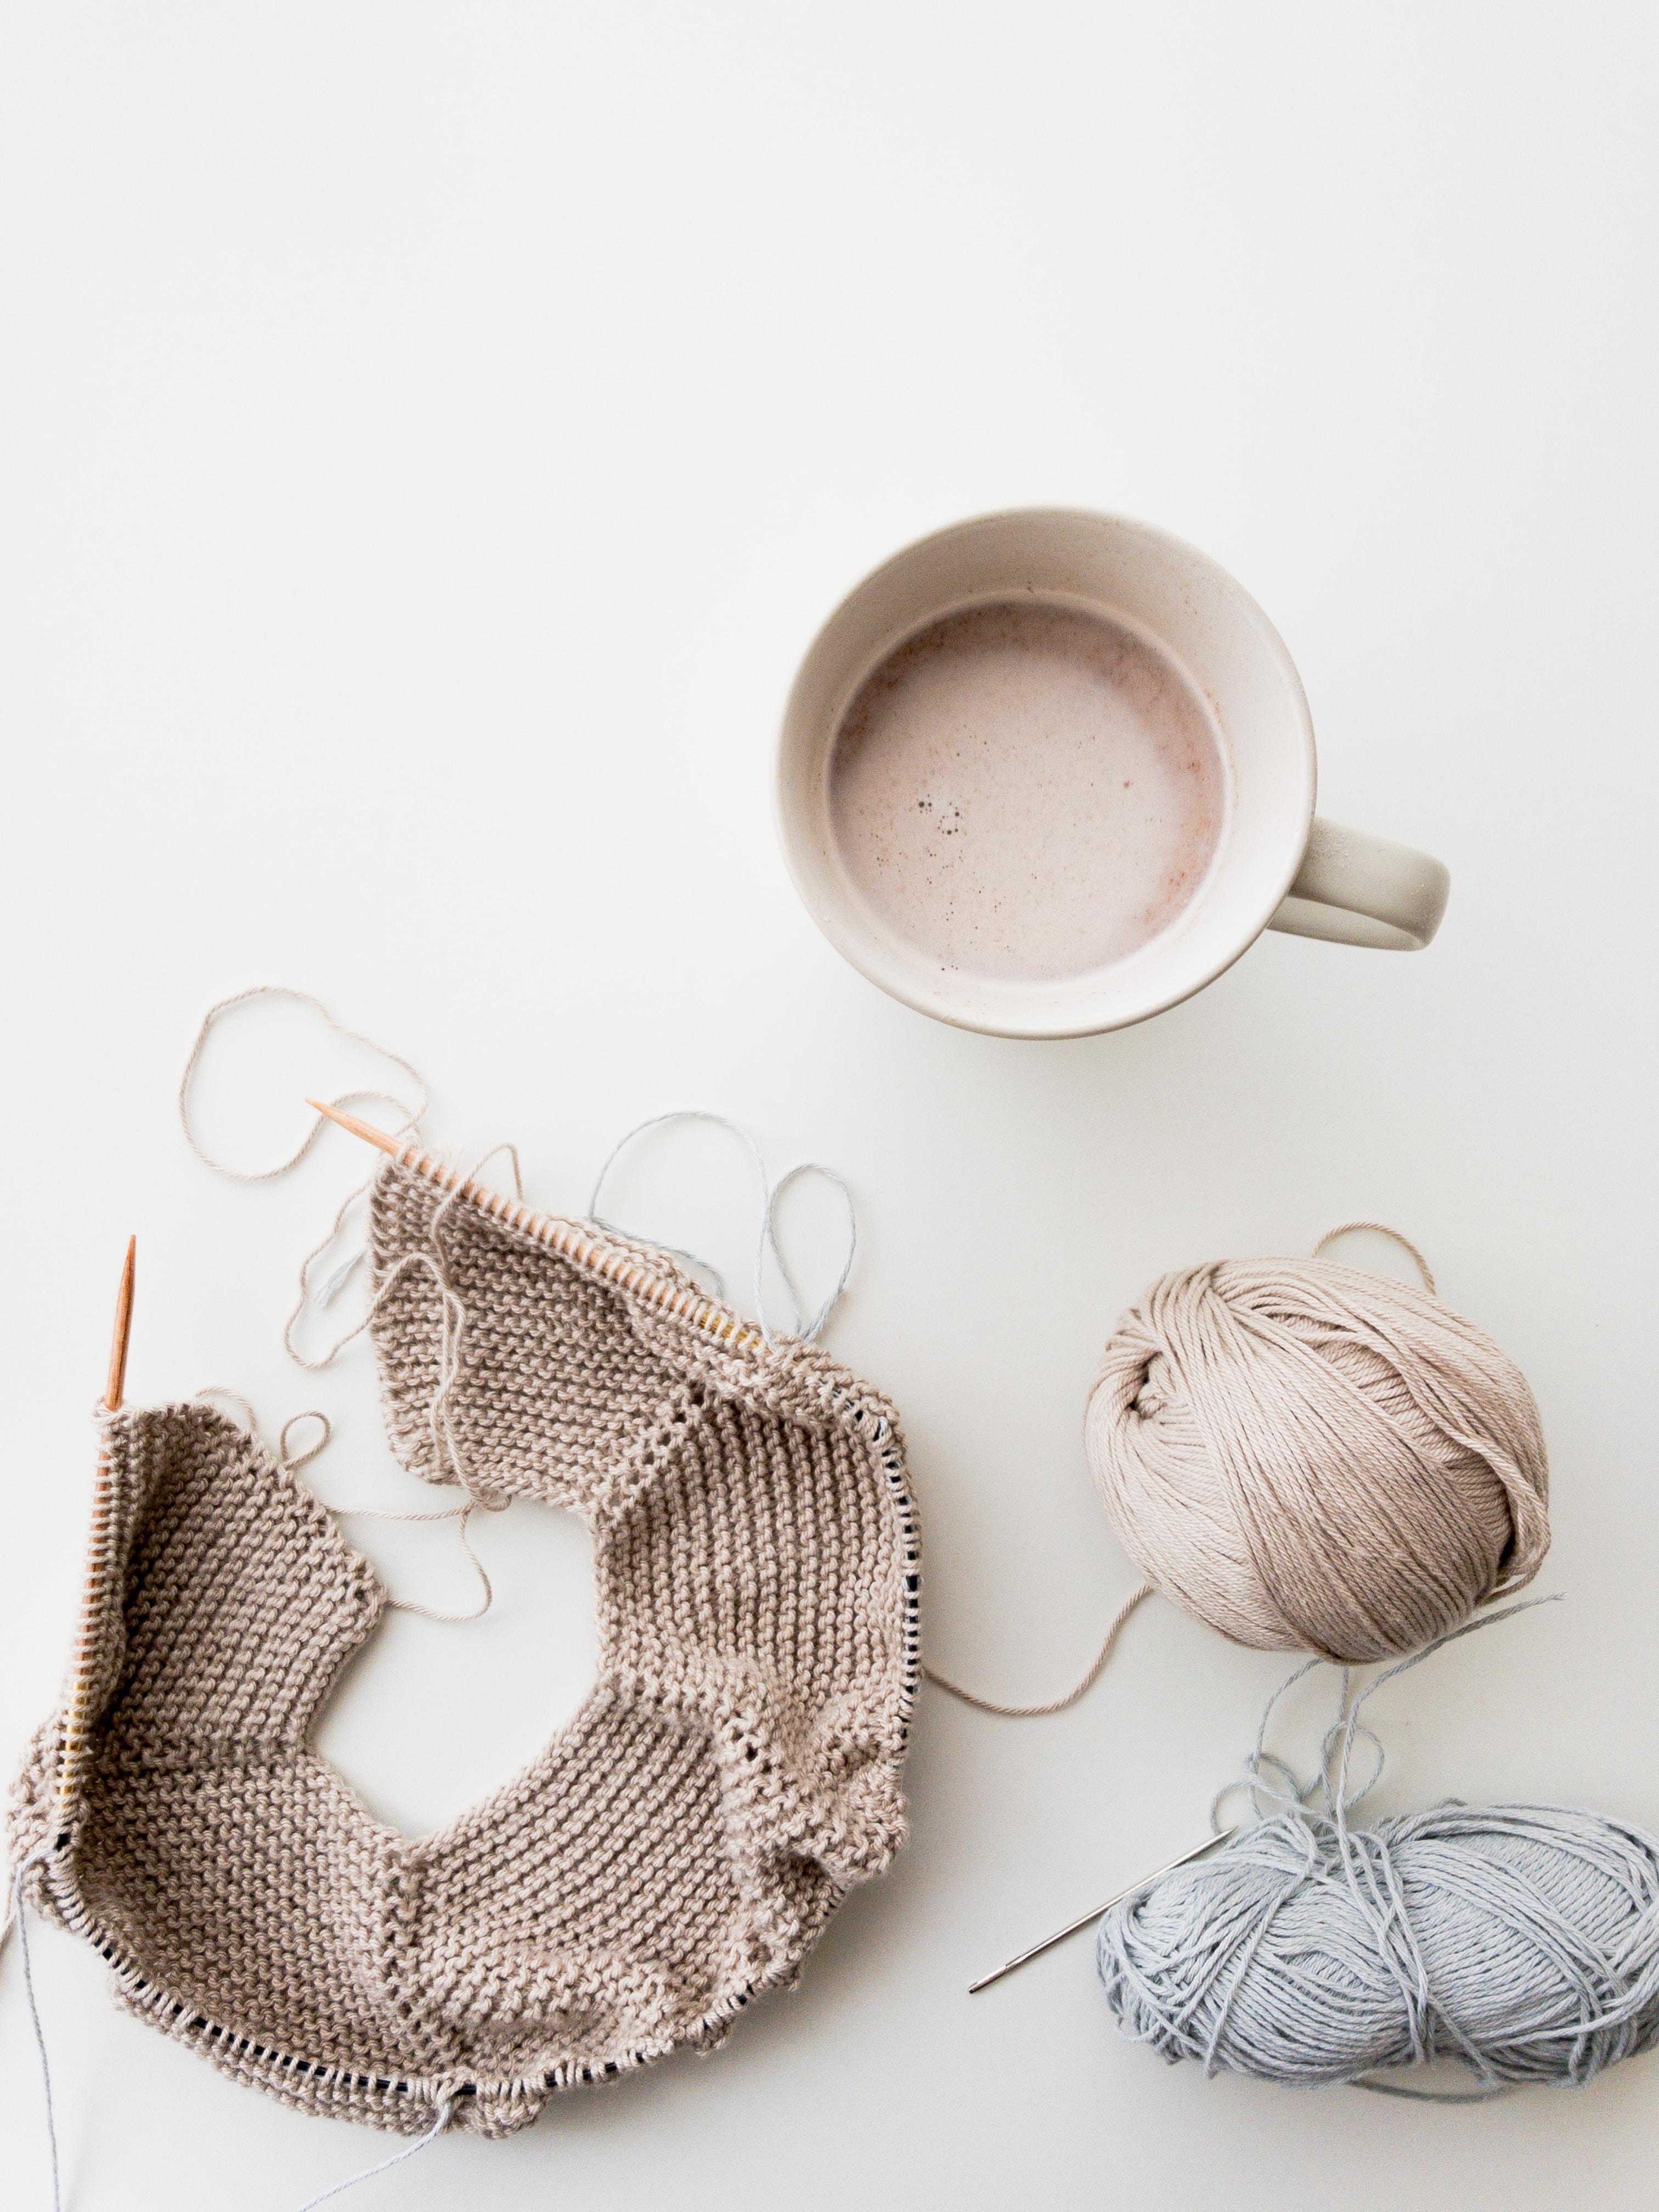 gray and blue yarns beside mug